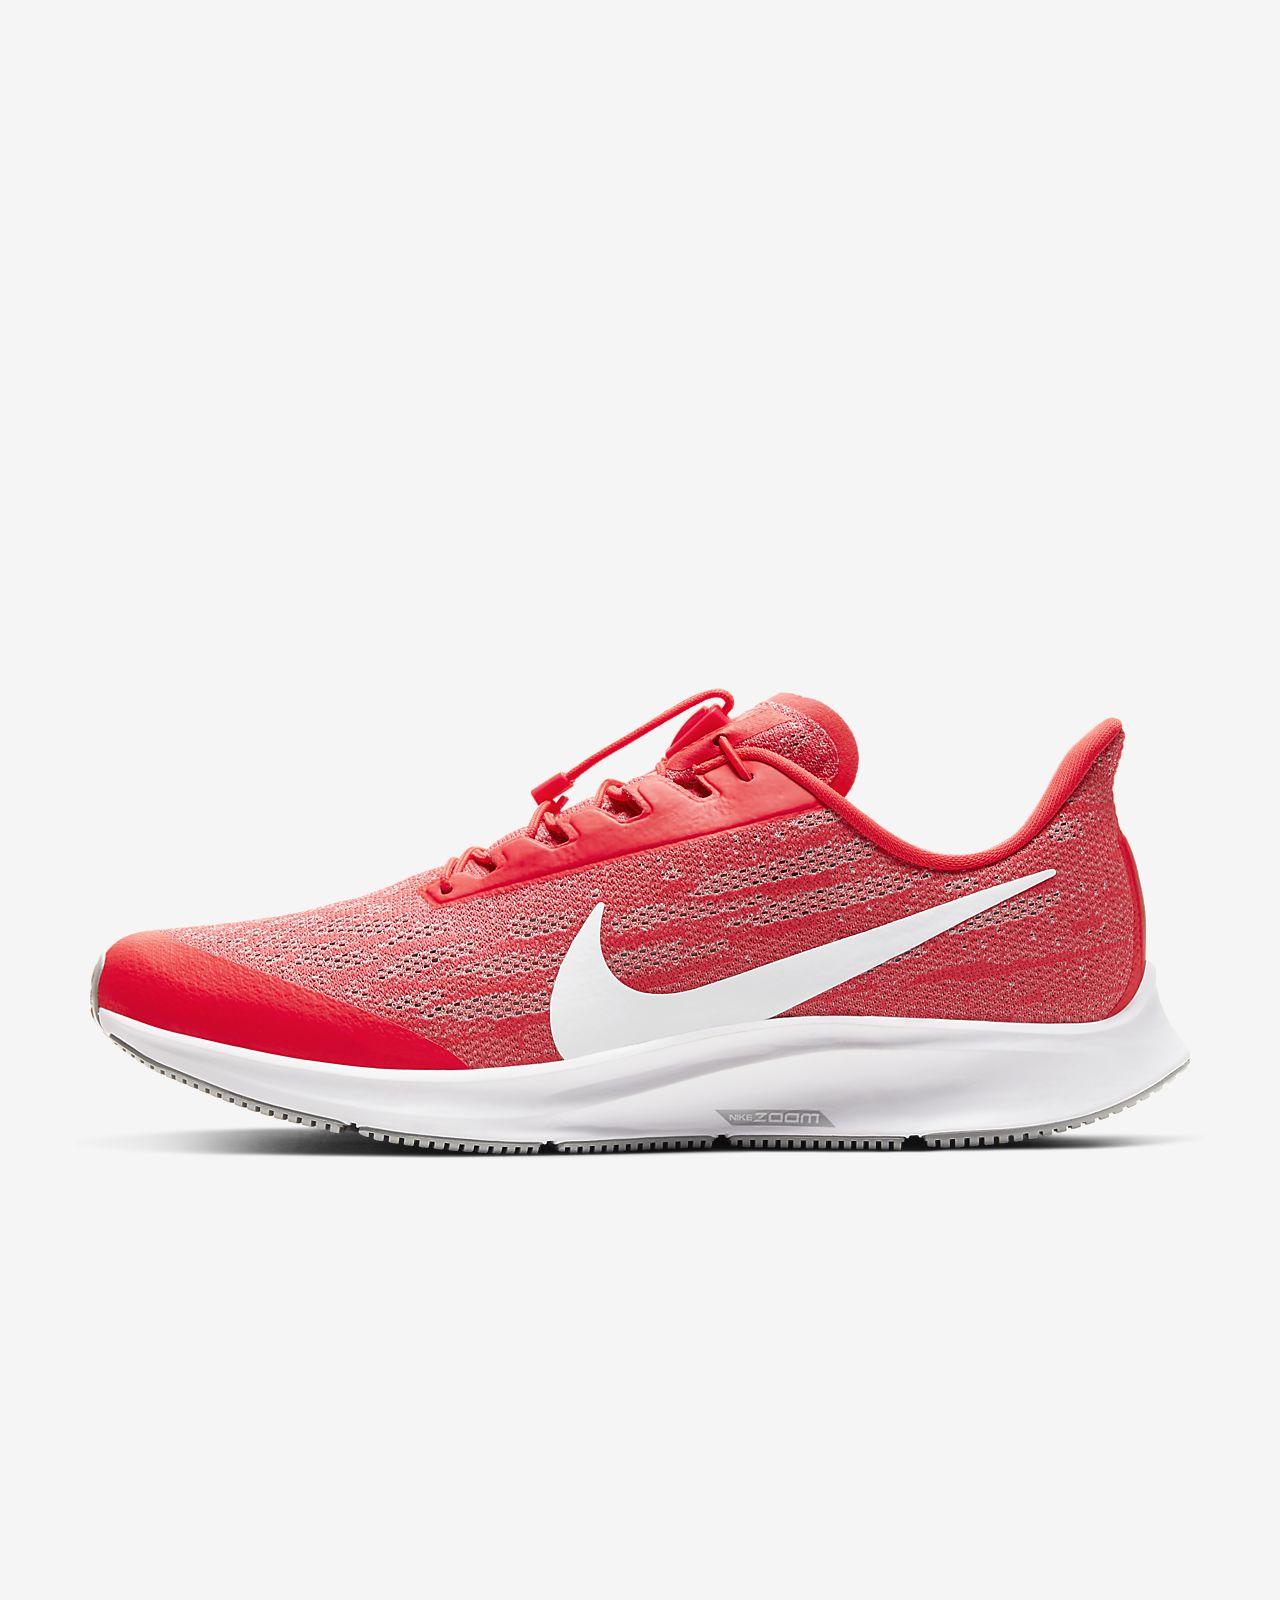 Nike Air Zoom Pegasus 36 FlyEase Herren-Laufschuh